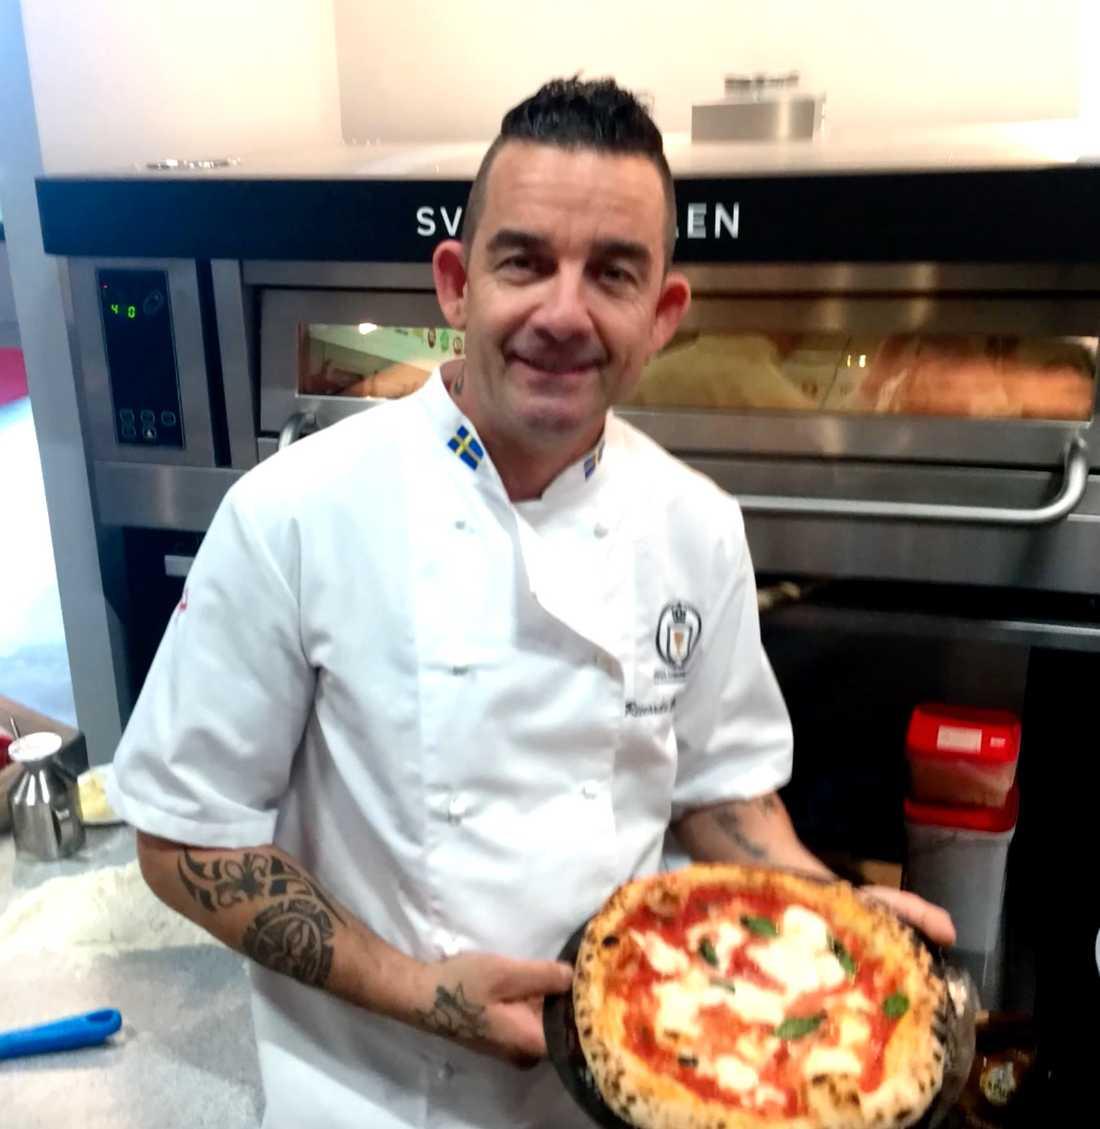 Riccardo var i Italien när restaurangen brann ner.